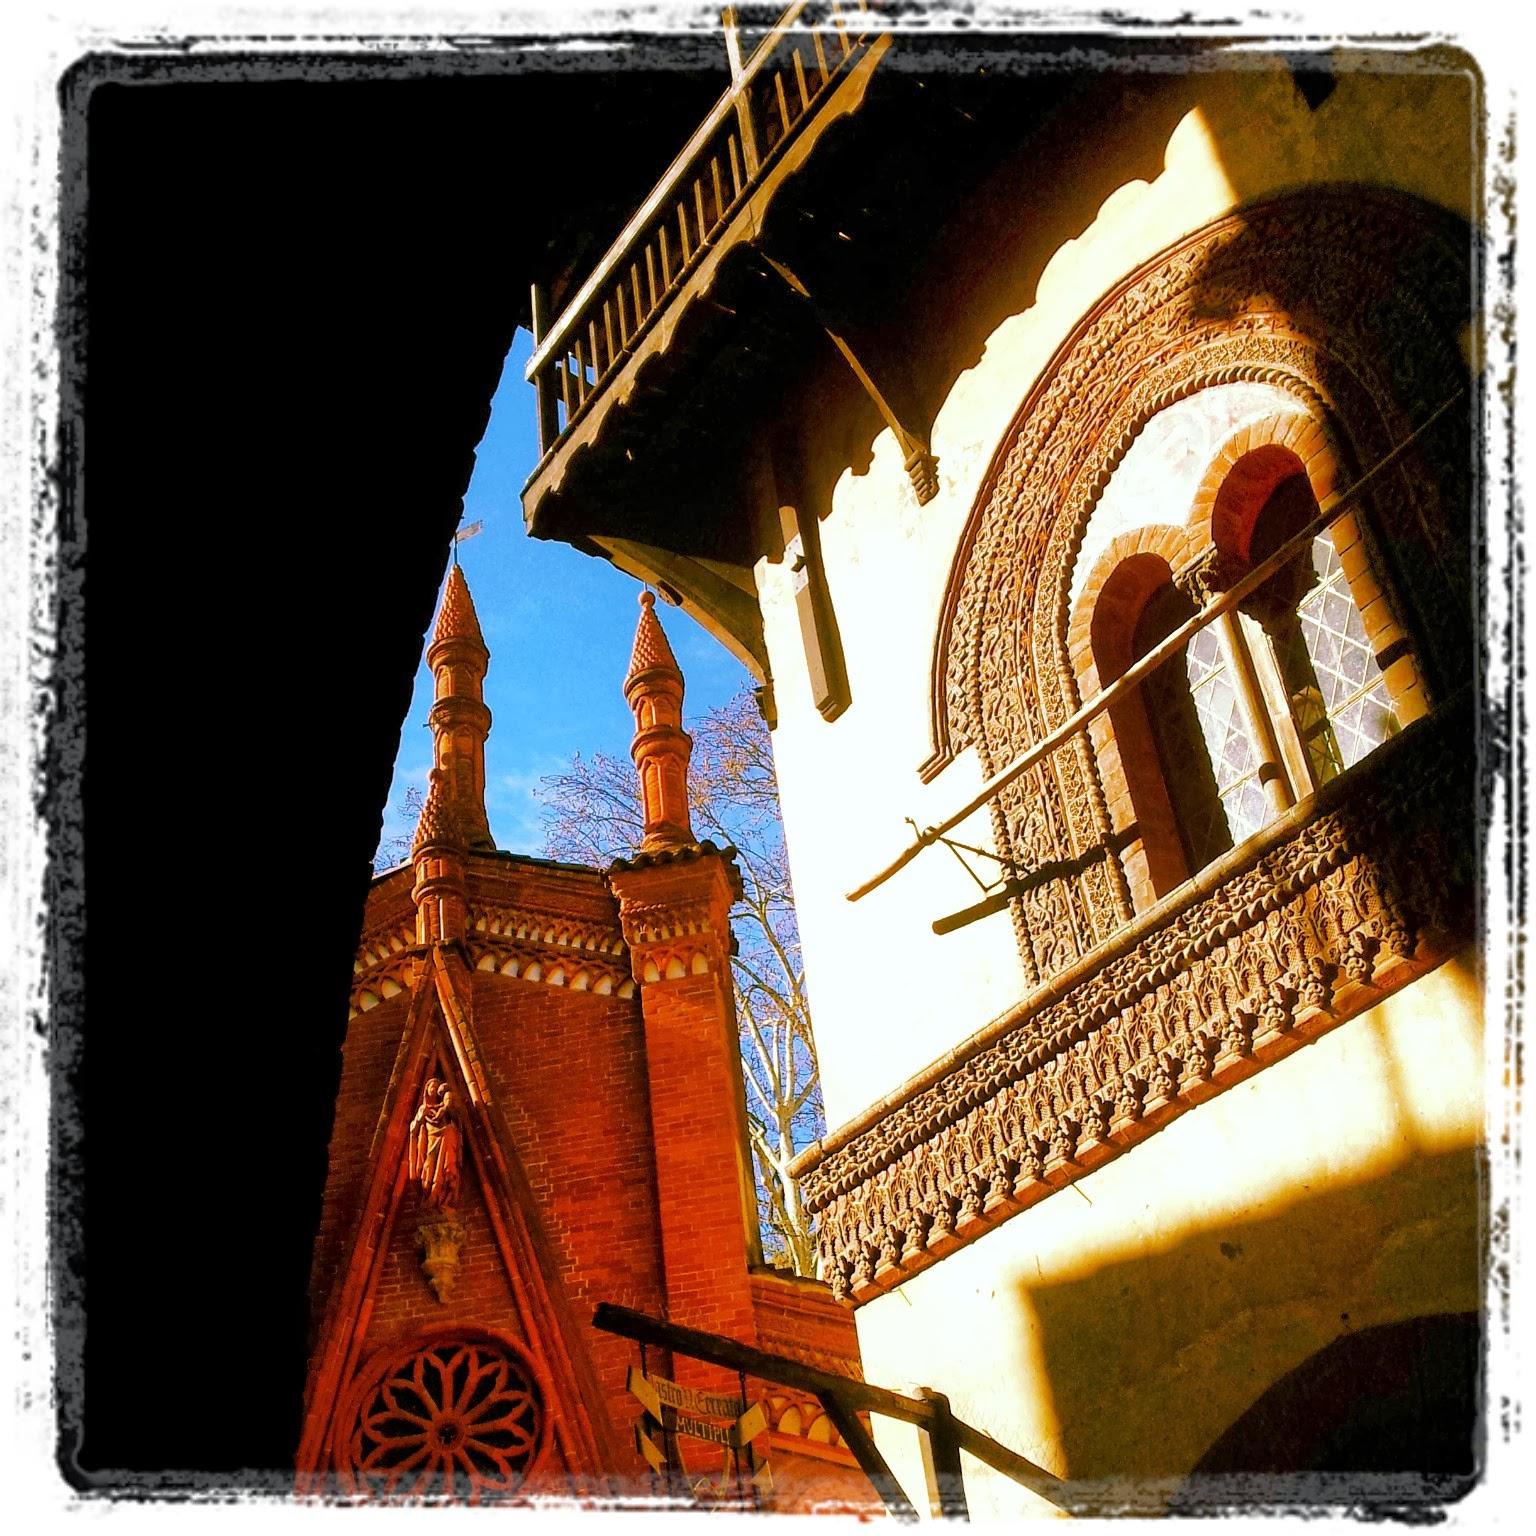 Borgo Medievale, Valentino Park, Turin